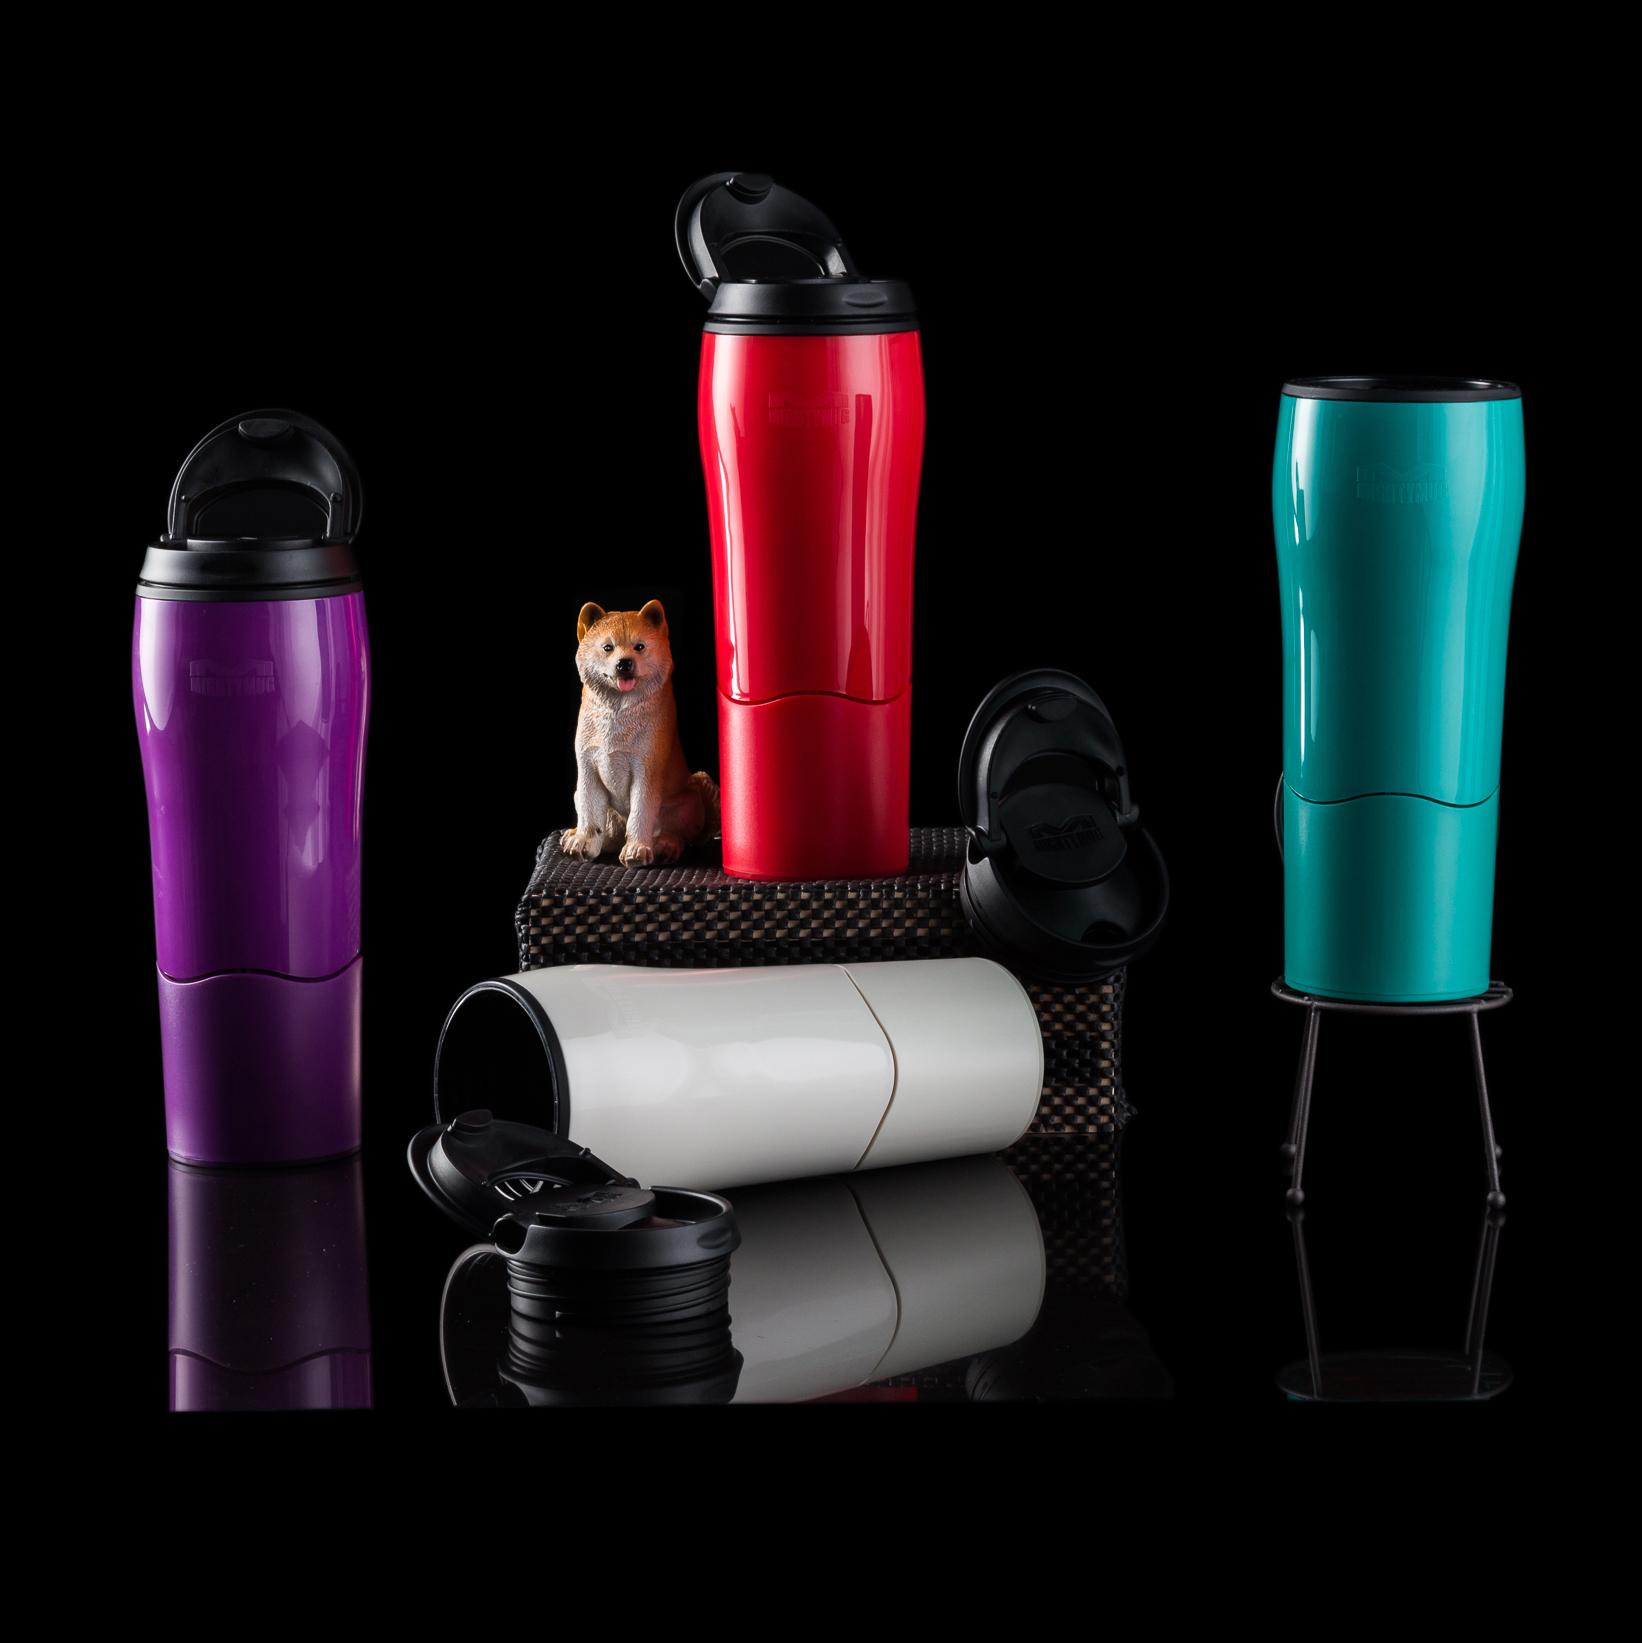 PRIM,CUSHY,FNOUTLET,Cushy,Prim,Fnoutlet,fnoutlet,MightyMugGo,Mug,SmartGrip,Technology,BPA,Cool,Cold,Ice,Hot,แก้วผลักไม่ล้ม,ผลักไม่ล้ม,แก้วมัค,แก้วน้ำดื่ม,แก้วน้ำร้อน,แก้วน้ำเย็น,แก้วร้อนเย็น,แก้วกินน้ำ,กระบอกกินน้ำ,กระบอกน้ำดื่ม,ขวดน้ำดื่ม,กินน้ำ,ดื่มน้ำ,แข็งแรง,ทนทาน,เท่ห์,โอปป้า,เรียบหรู,สวยใส,เกาหลี,ญี่ปุ่น,ชิค,ชิลๆ,เก๋,กิ๊บเก๋,น่ารัก,แก้วน้ำ